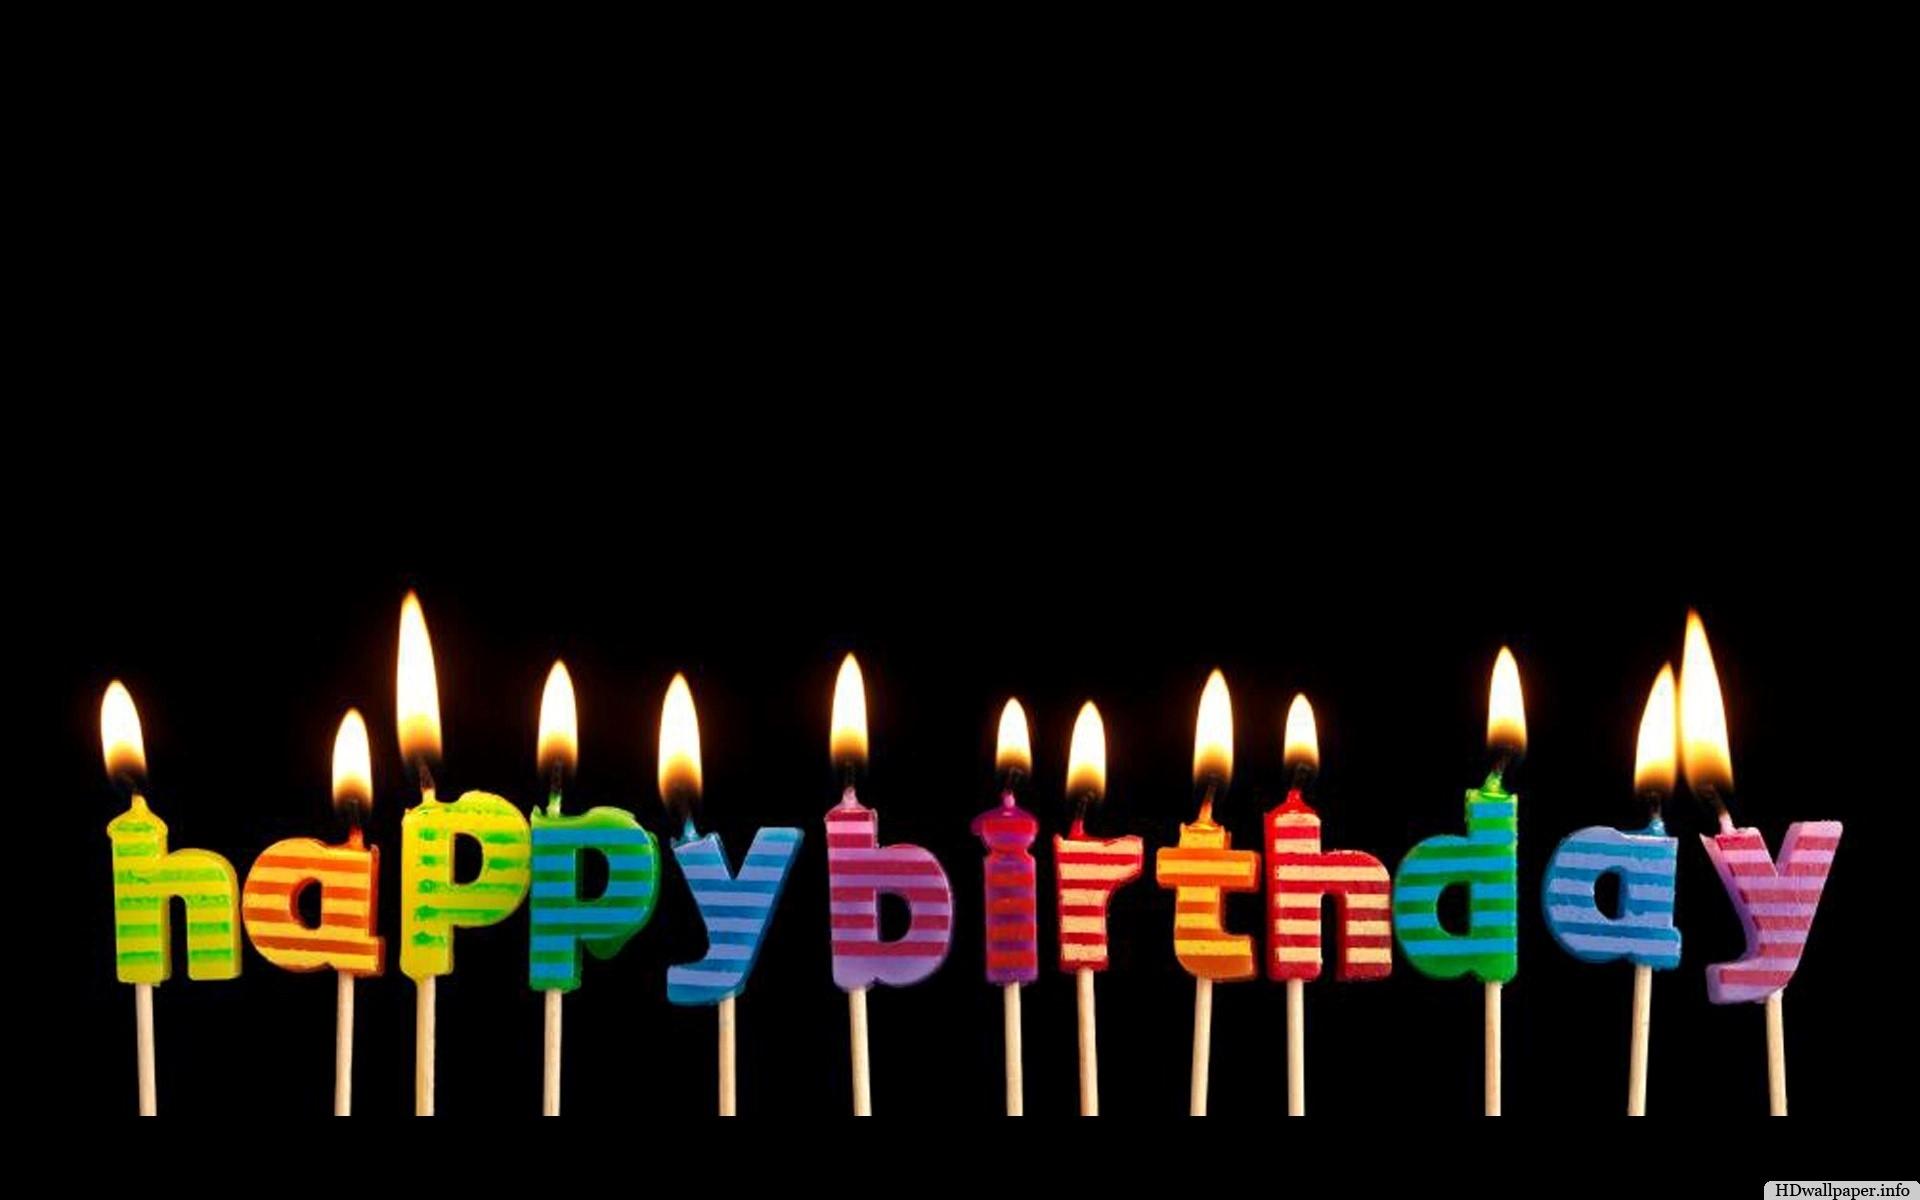 happy birthday desktop wallpaper - http://hdwallpaper/happy